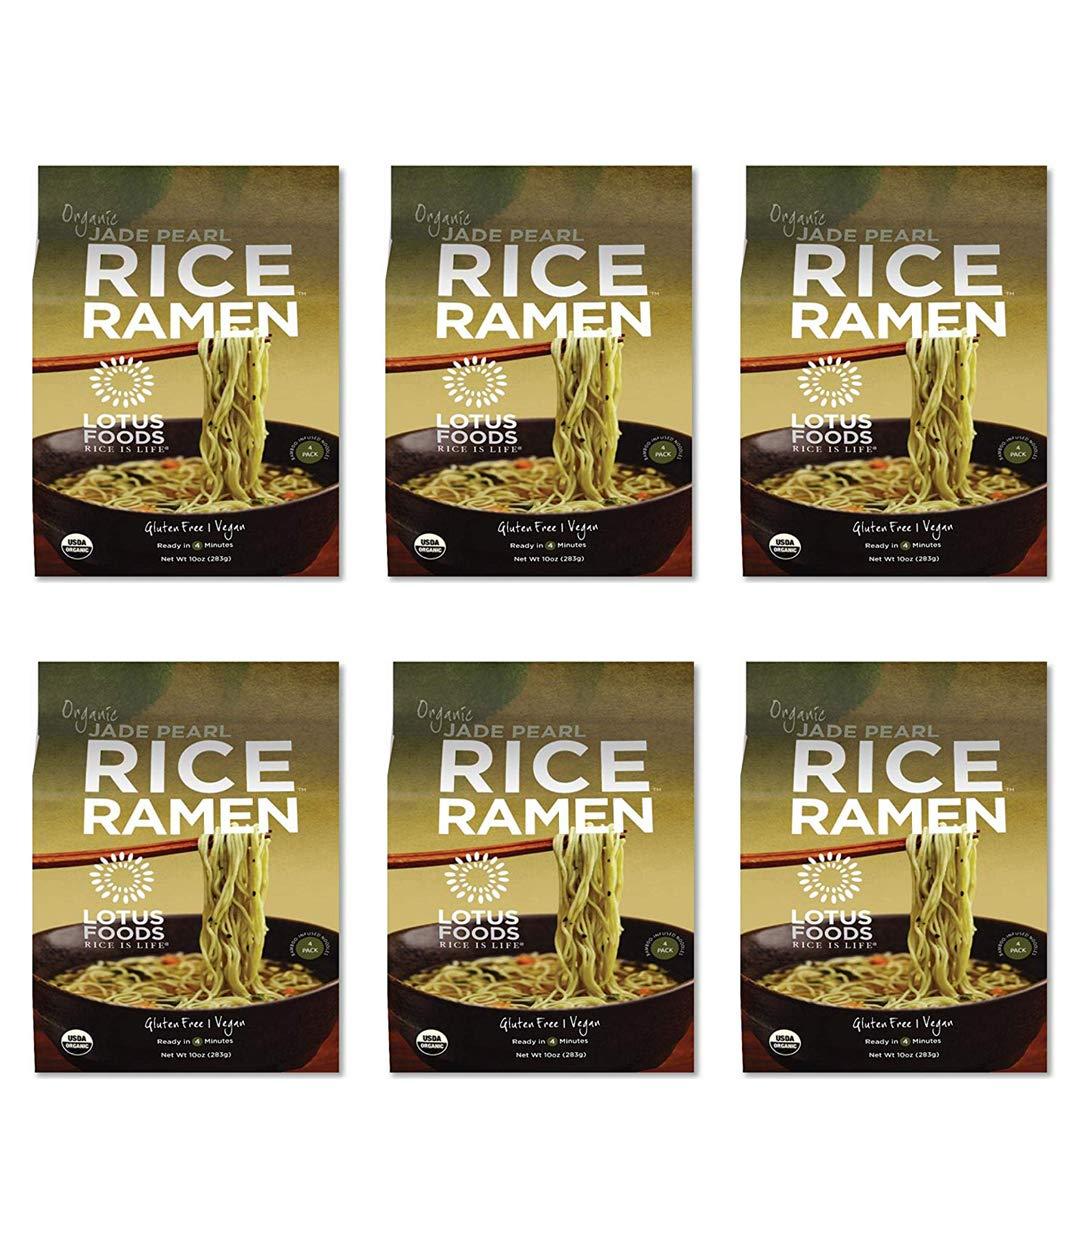 Lotus Foods Organic Quick-Cook Jade Pearl Rice Ramen Noodles, 10 oz, 6Count by Lotus Foods